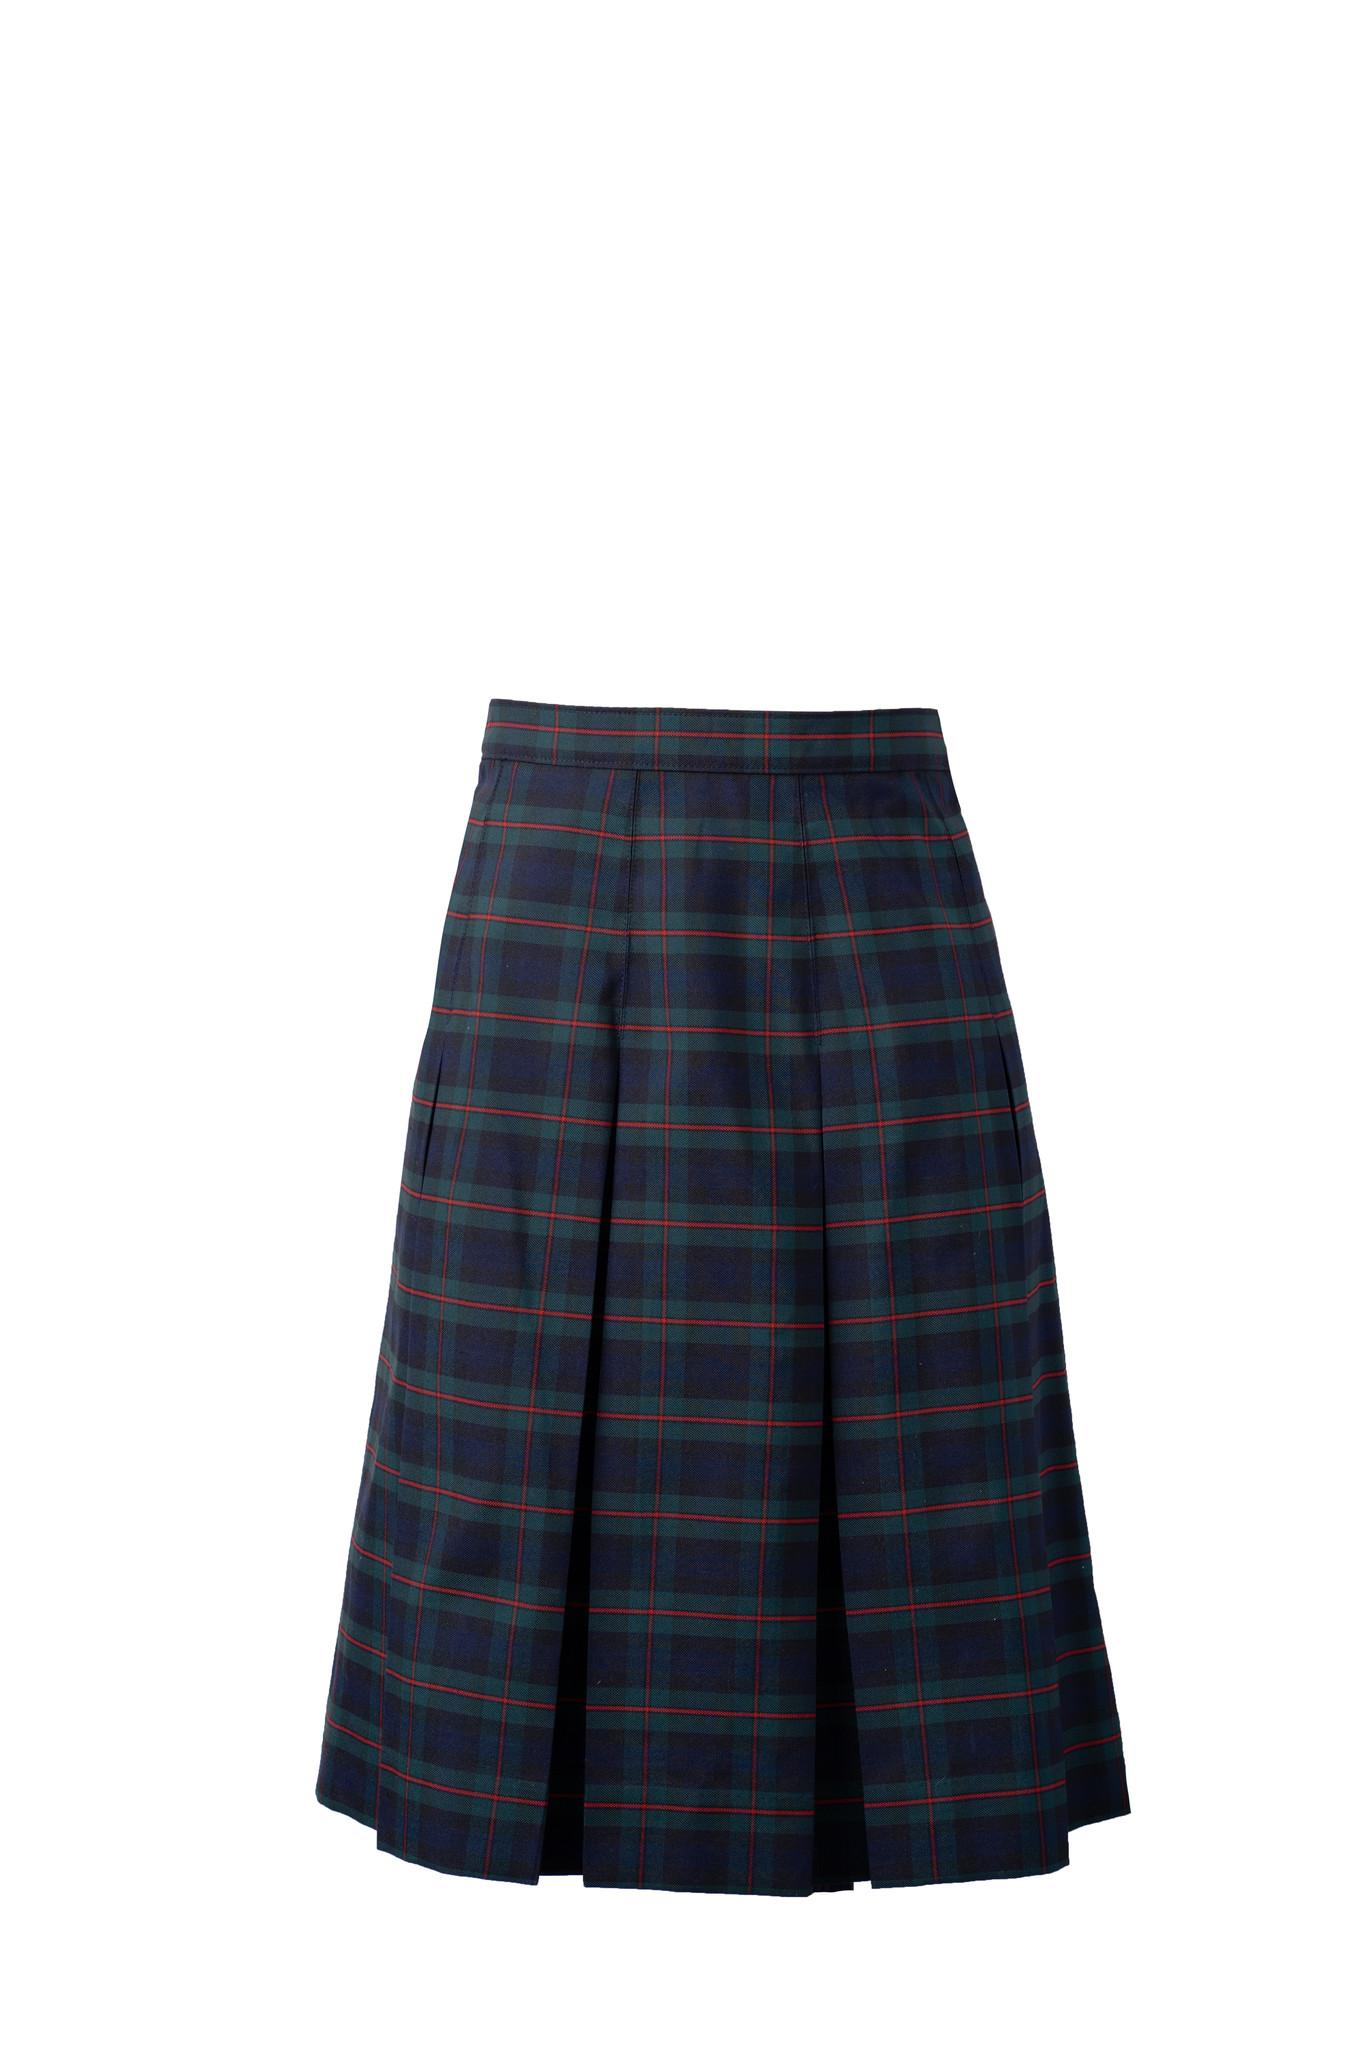 St. Monica Skirt (3958GH07 #88) Half Size